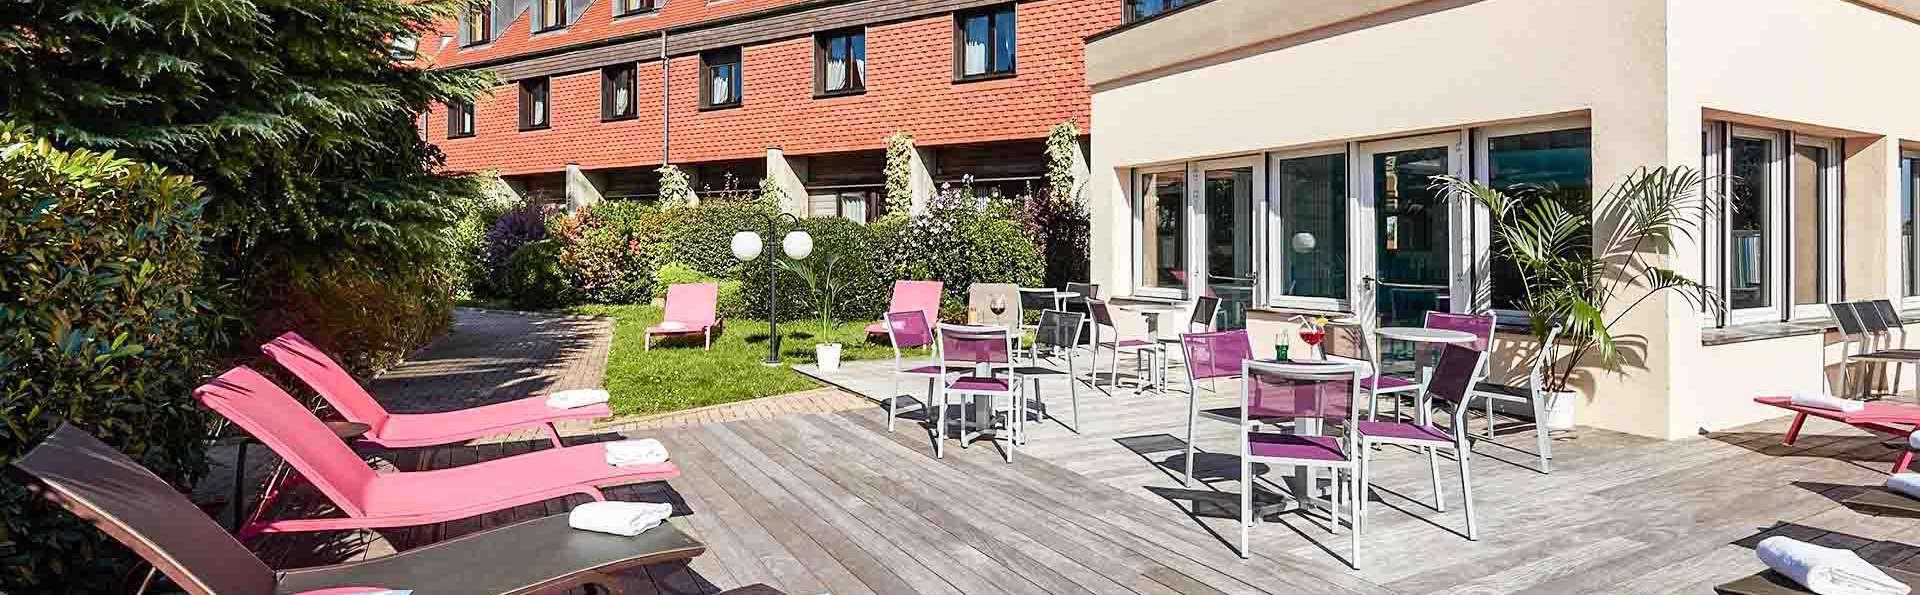 Hôtel l'Europe - EDIT_Terrasse_Piscine_01.jpg